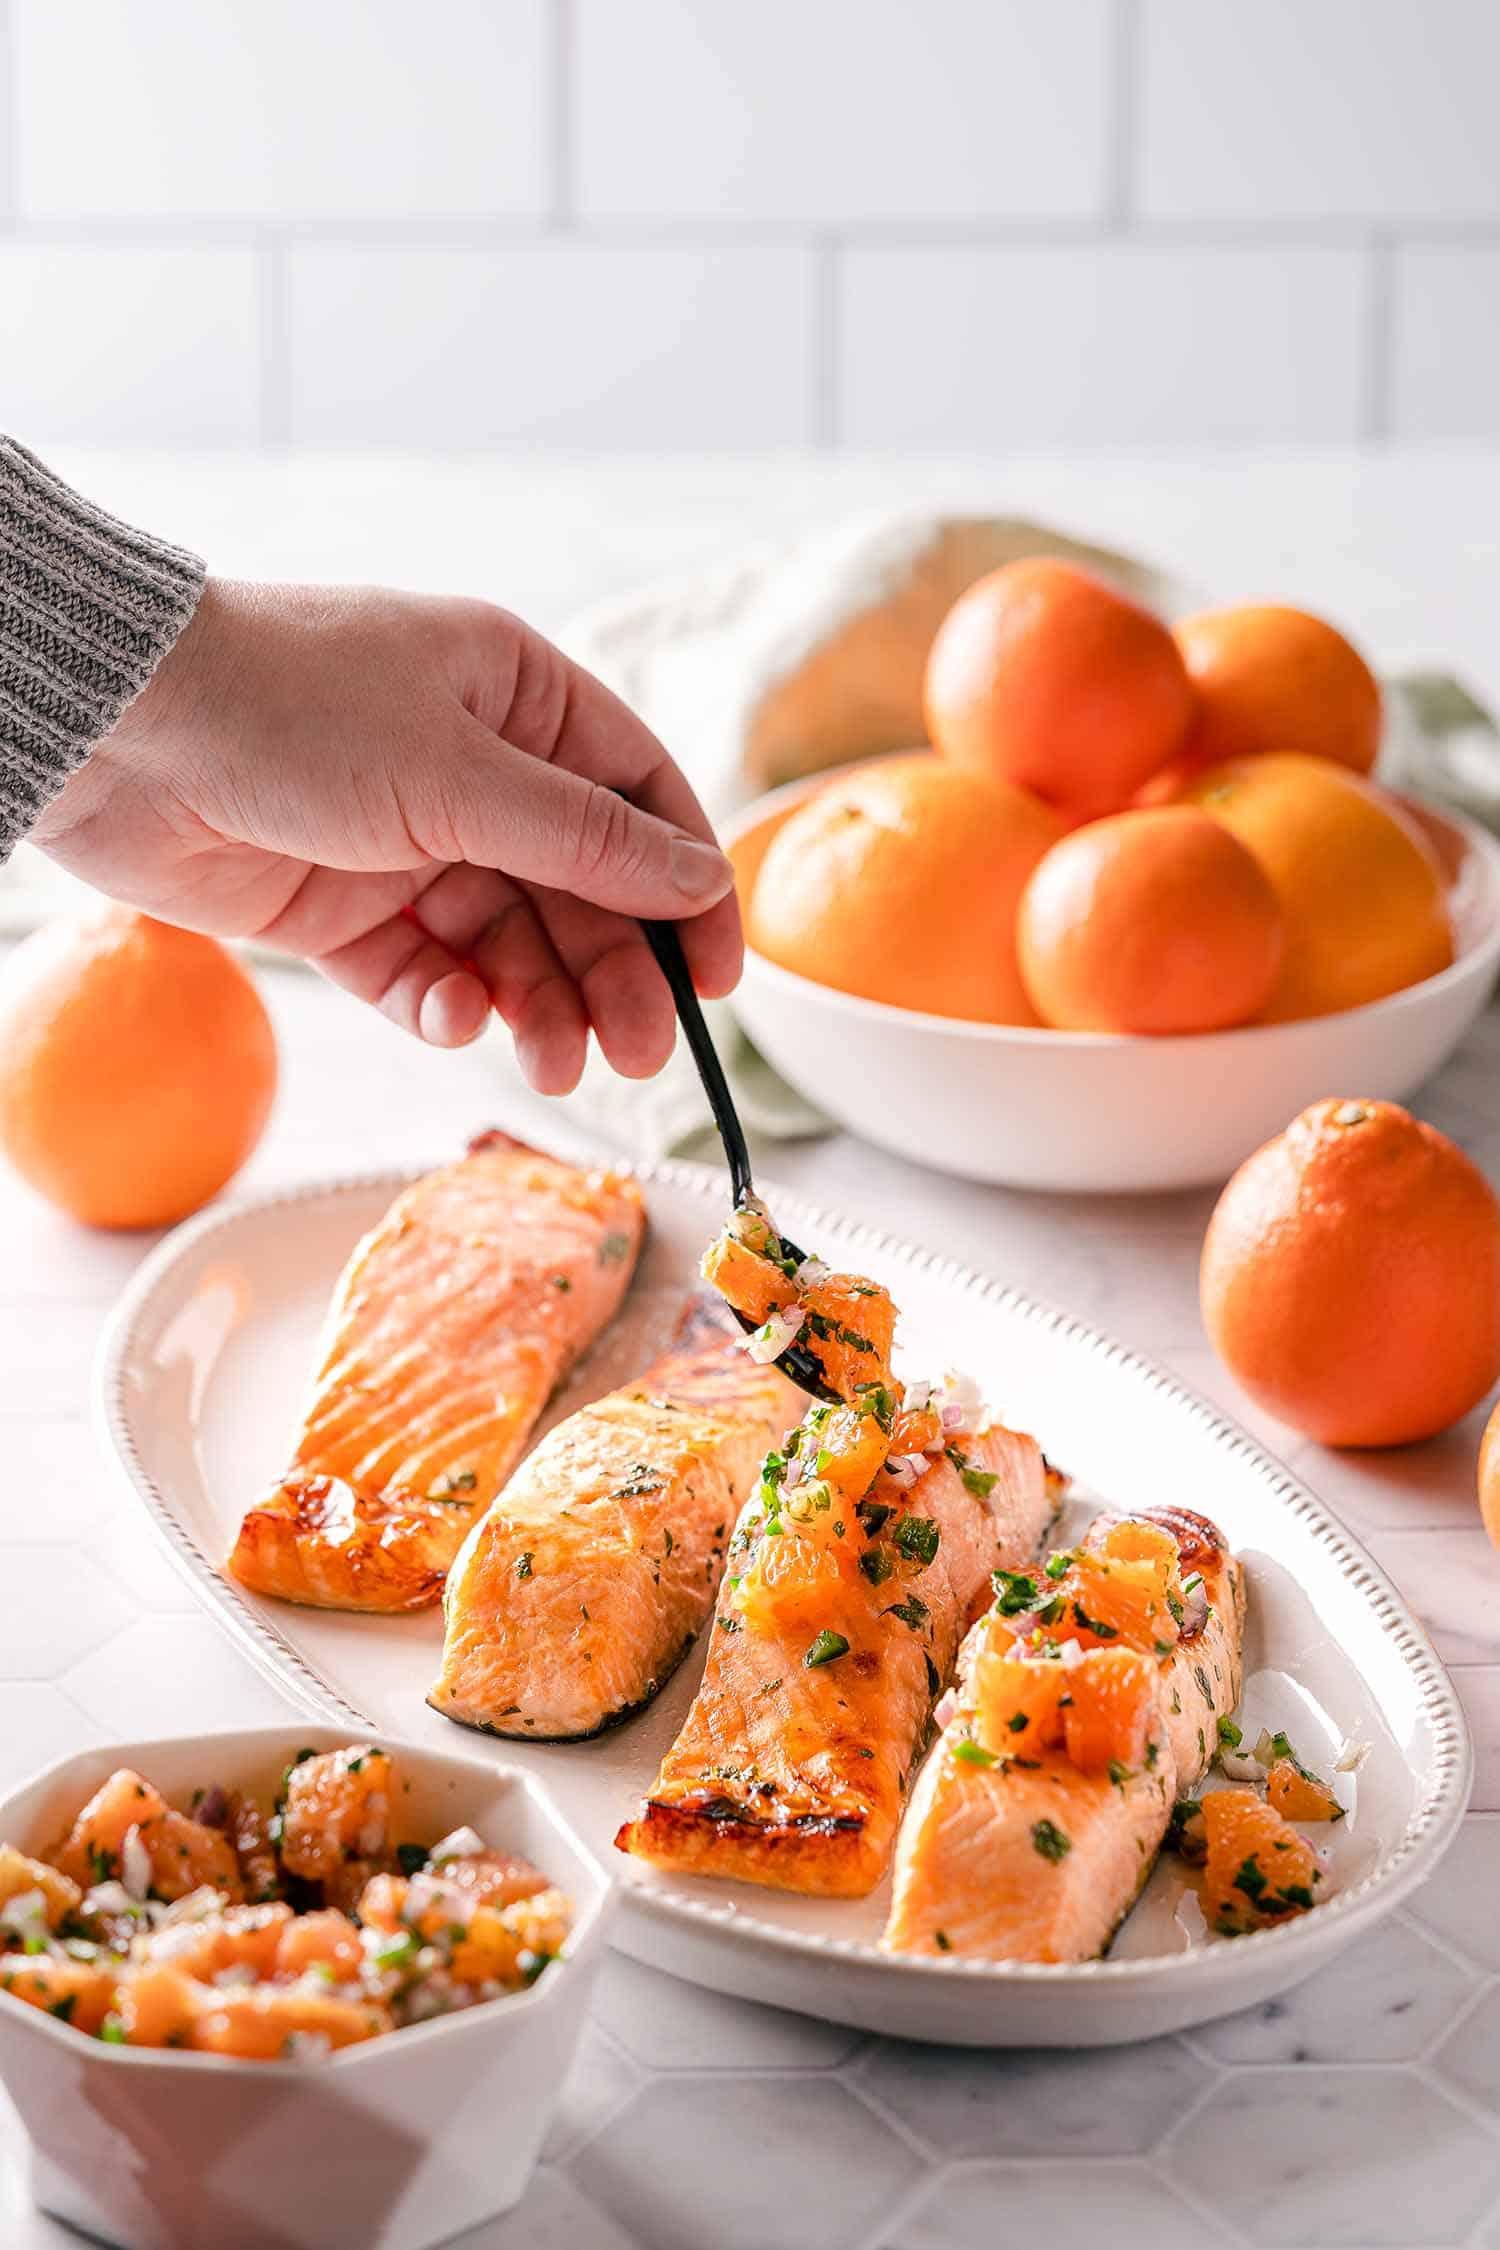 hand spooning orange salsa over broiled salmon on platter